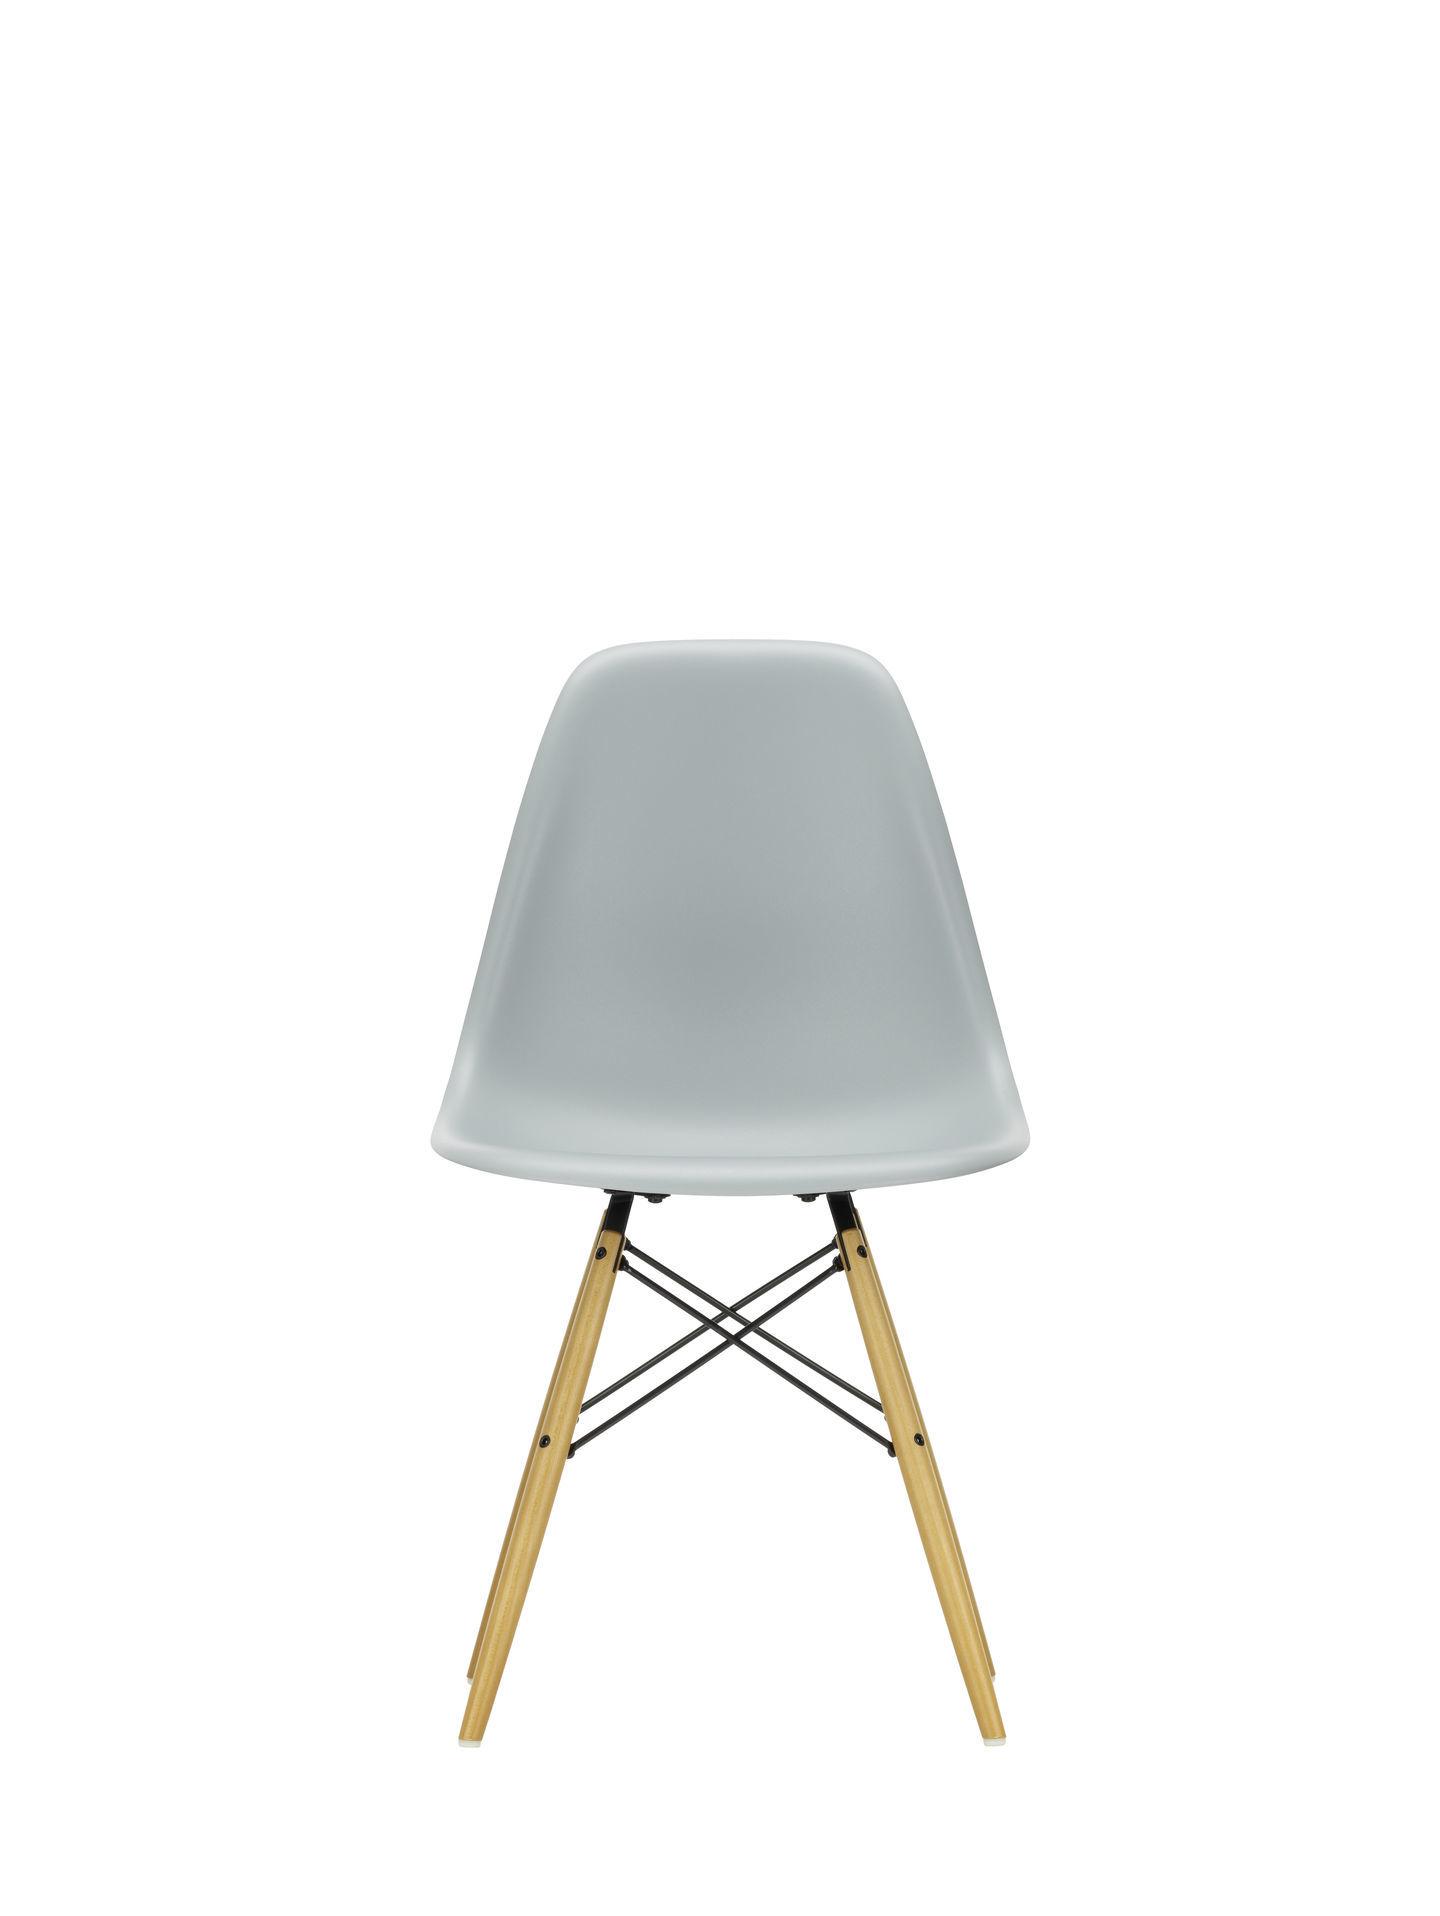 Eames Plastic Side Chair DSW Stuhl Vitra